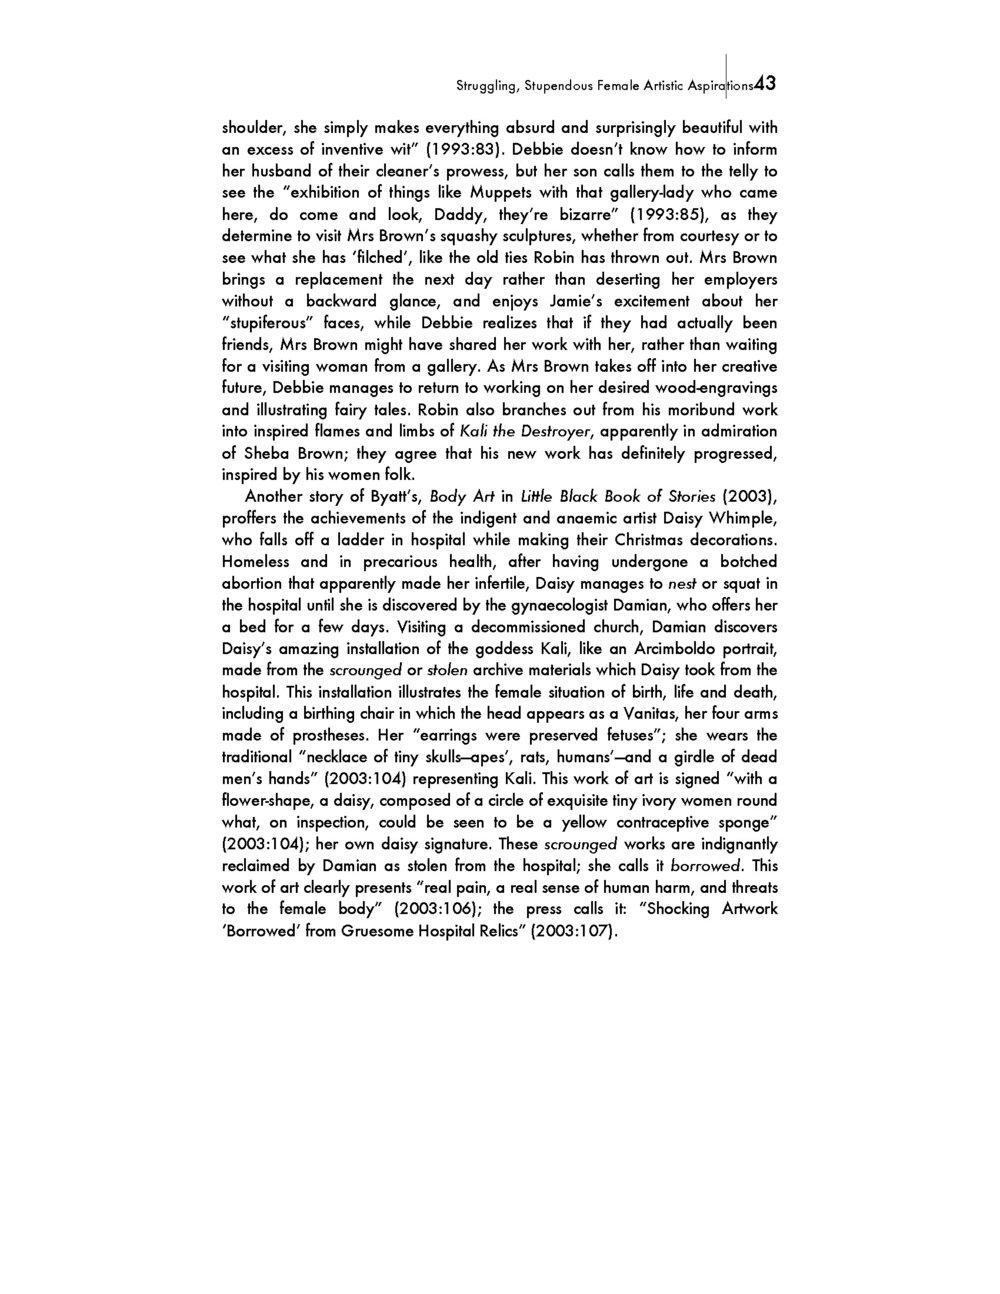 StrugglingStupendousFemalep31_Page_13.jpg